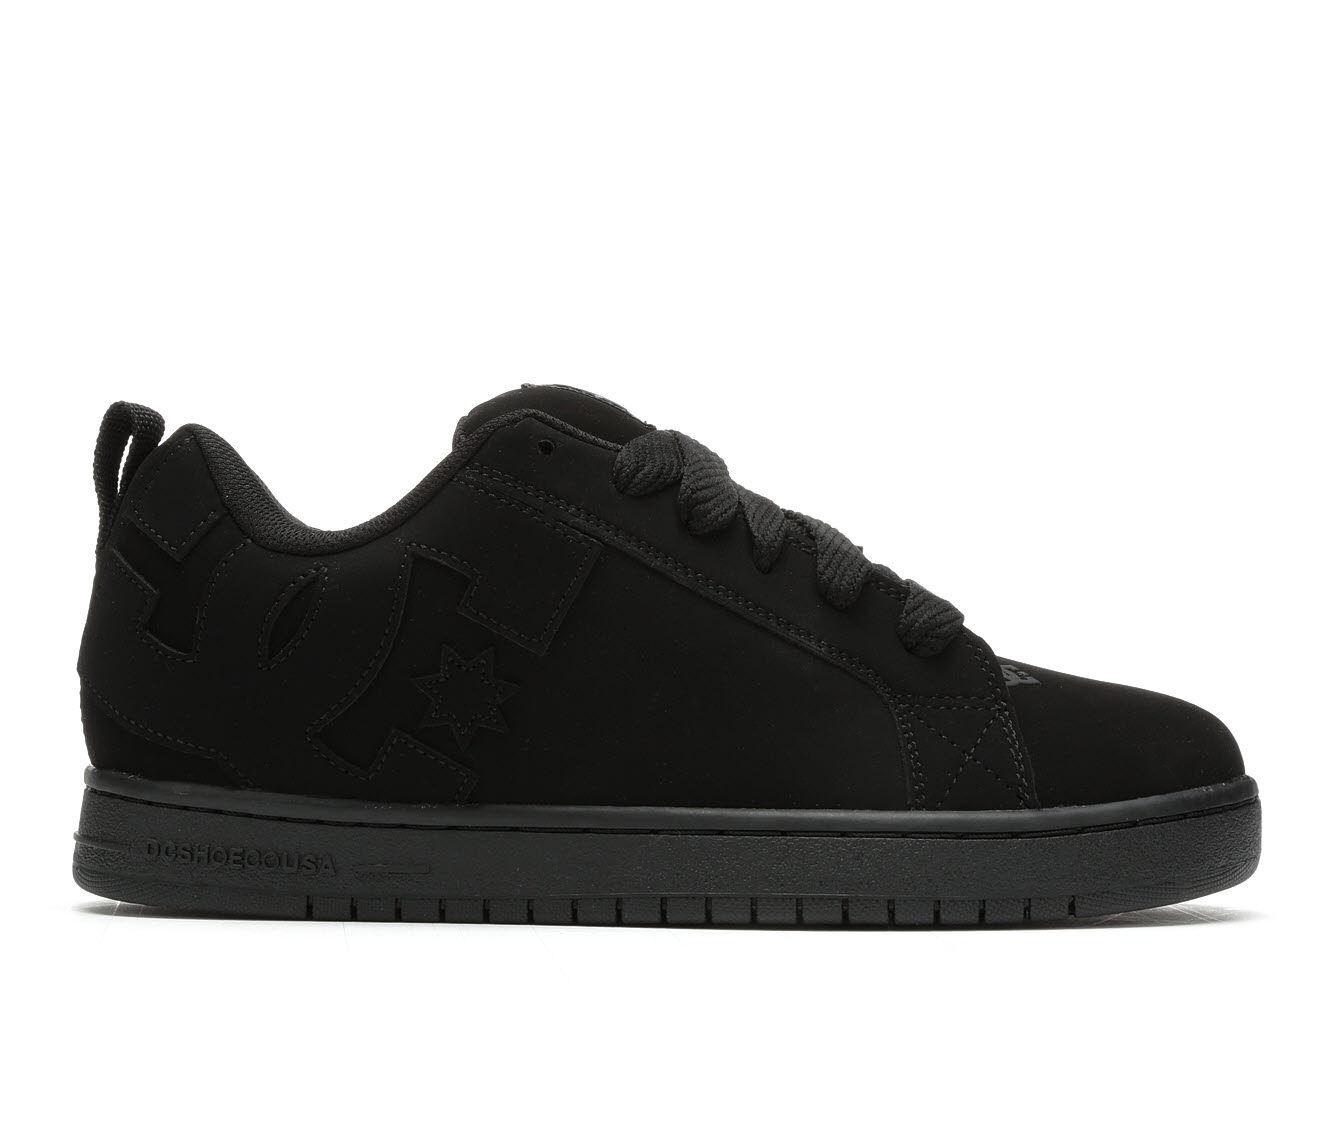 Men's DC Court Graffik Skate Shoes Black/Black